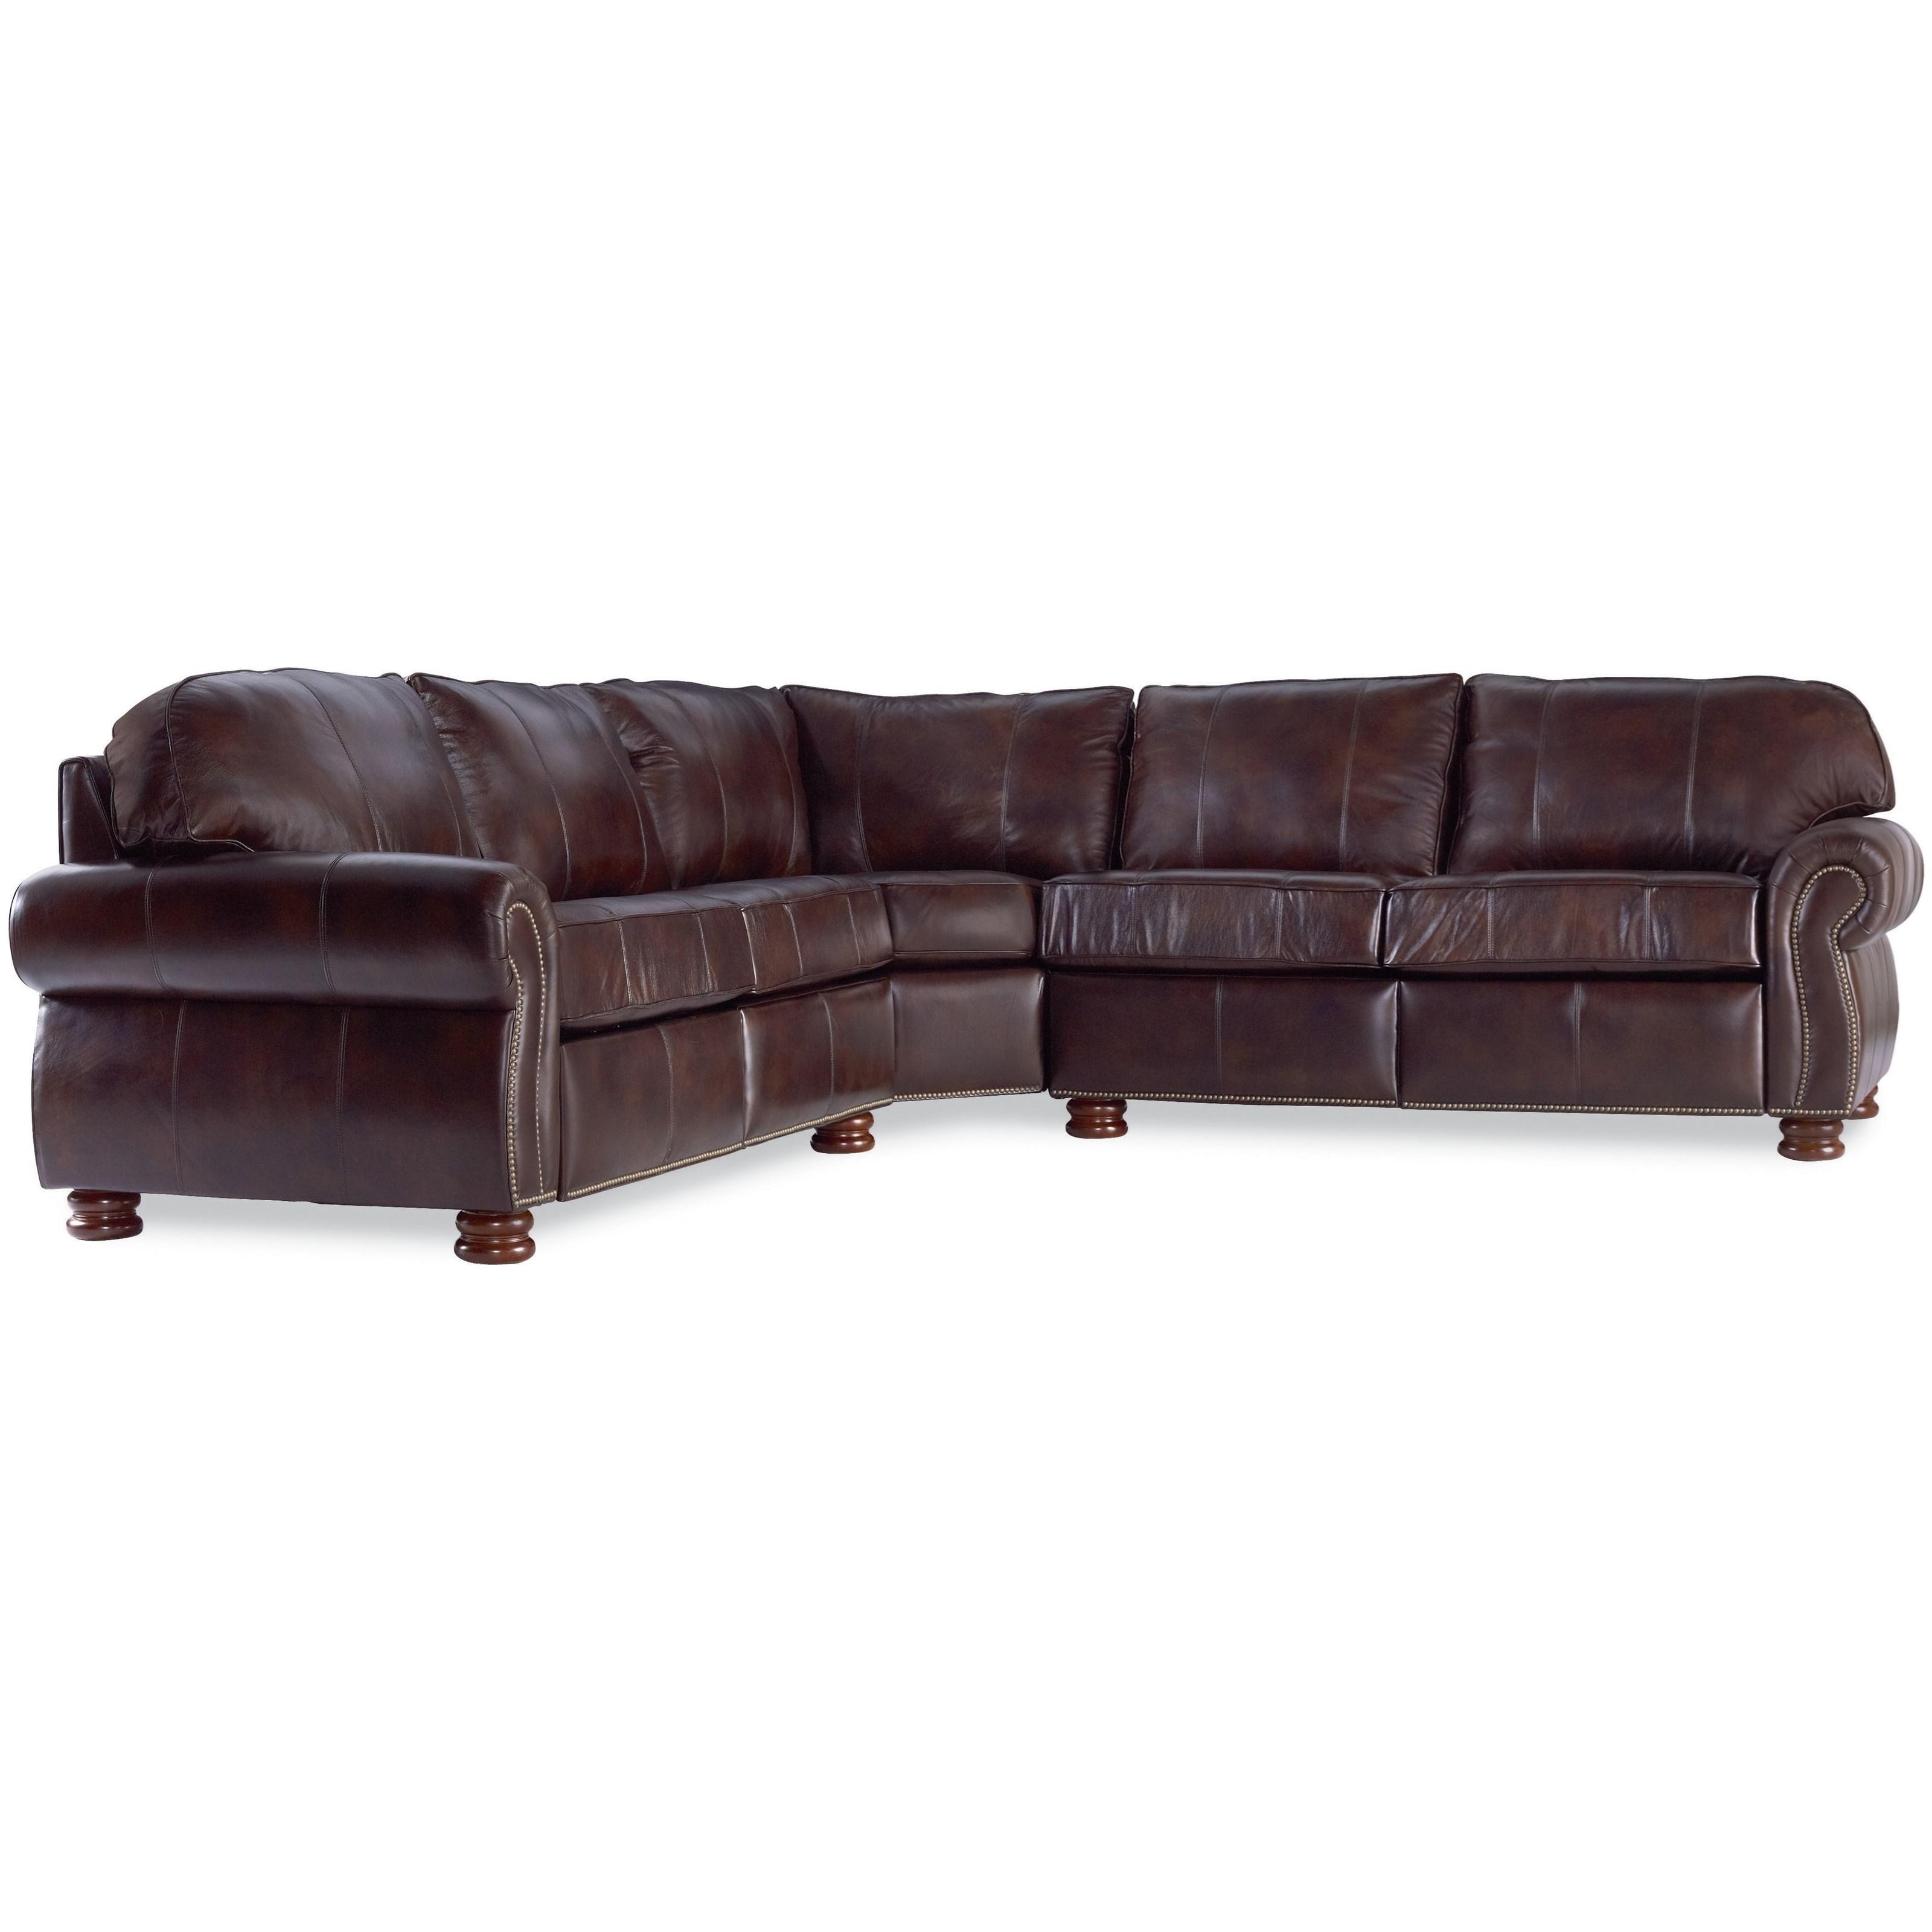 thomasville benjamin sofa cheap traditional sofas uk double fudge energywarden